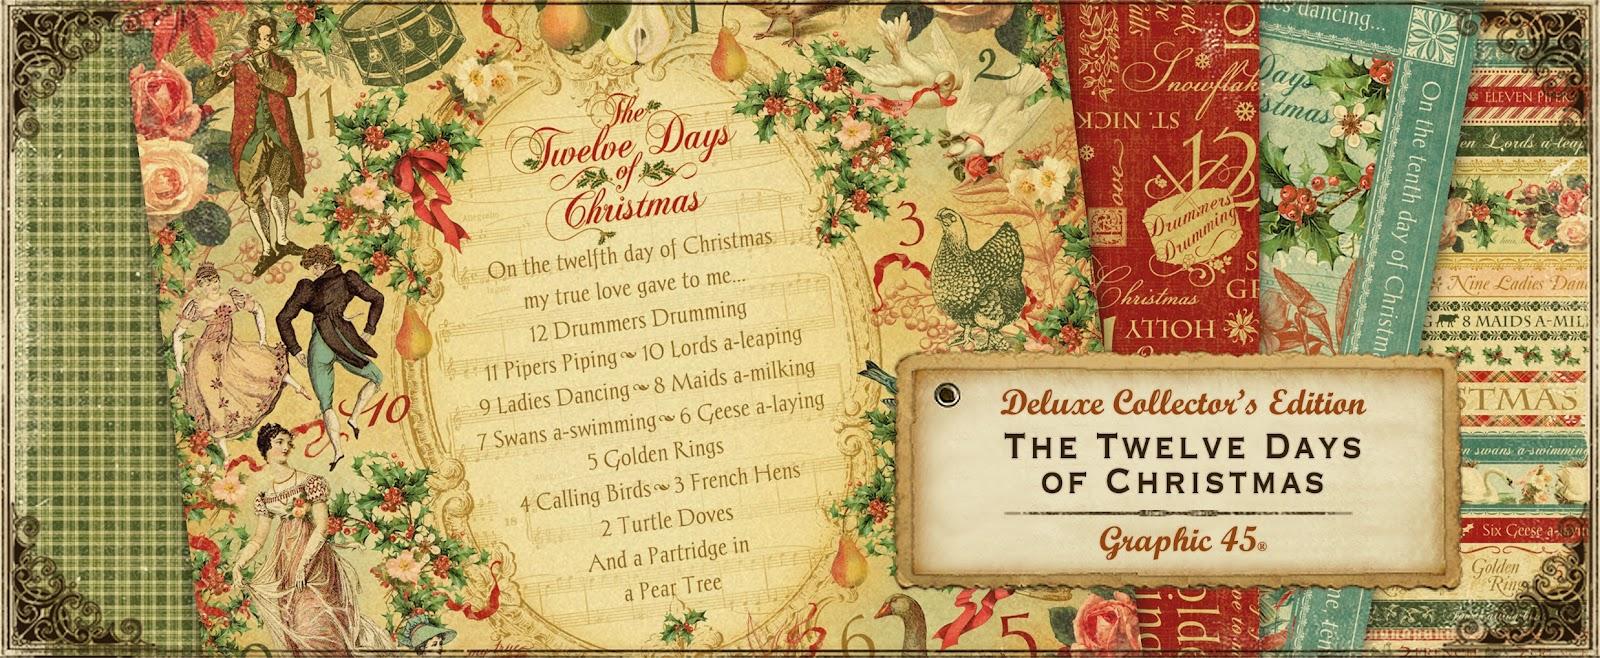 the twelve days of christmas - 10 Days Of Christmas